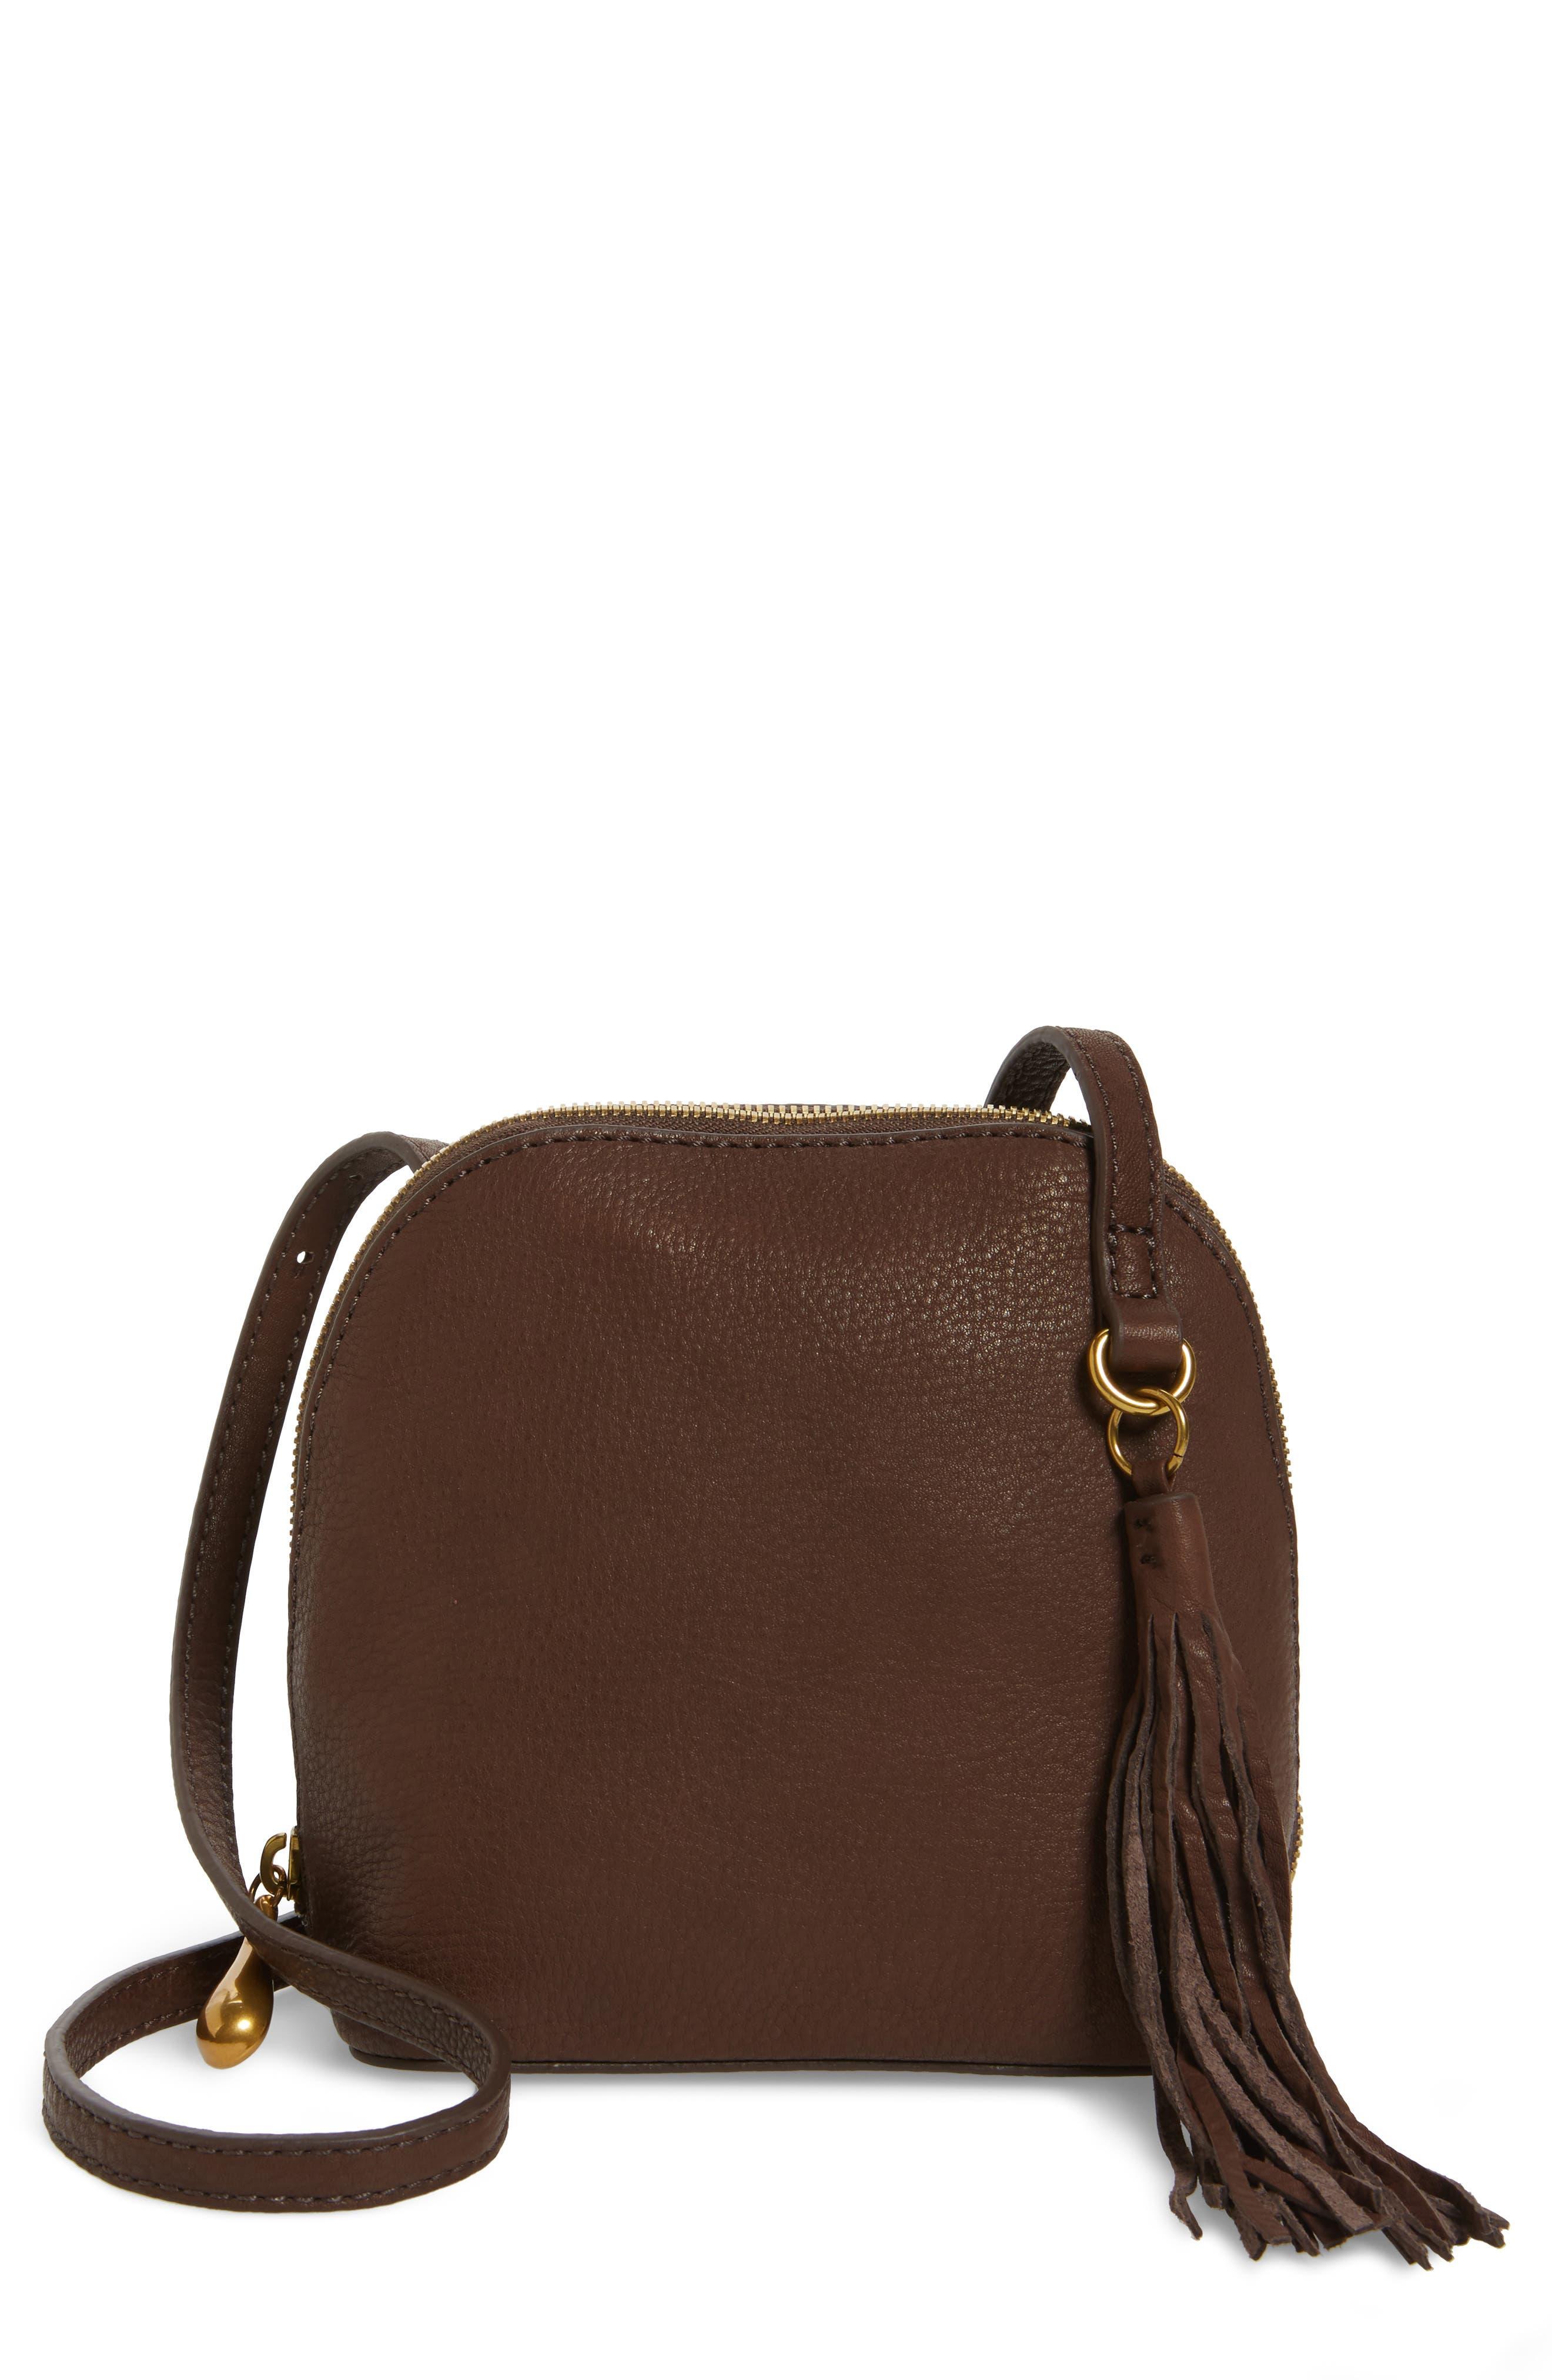 Main Image - Hobo Nash Calfskin Leather Crossbody Bag